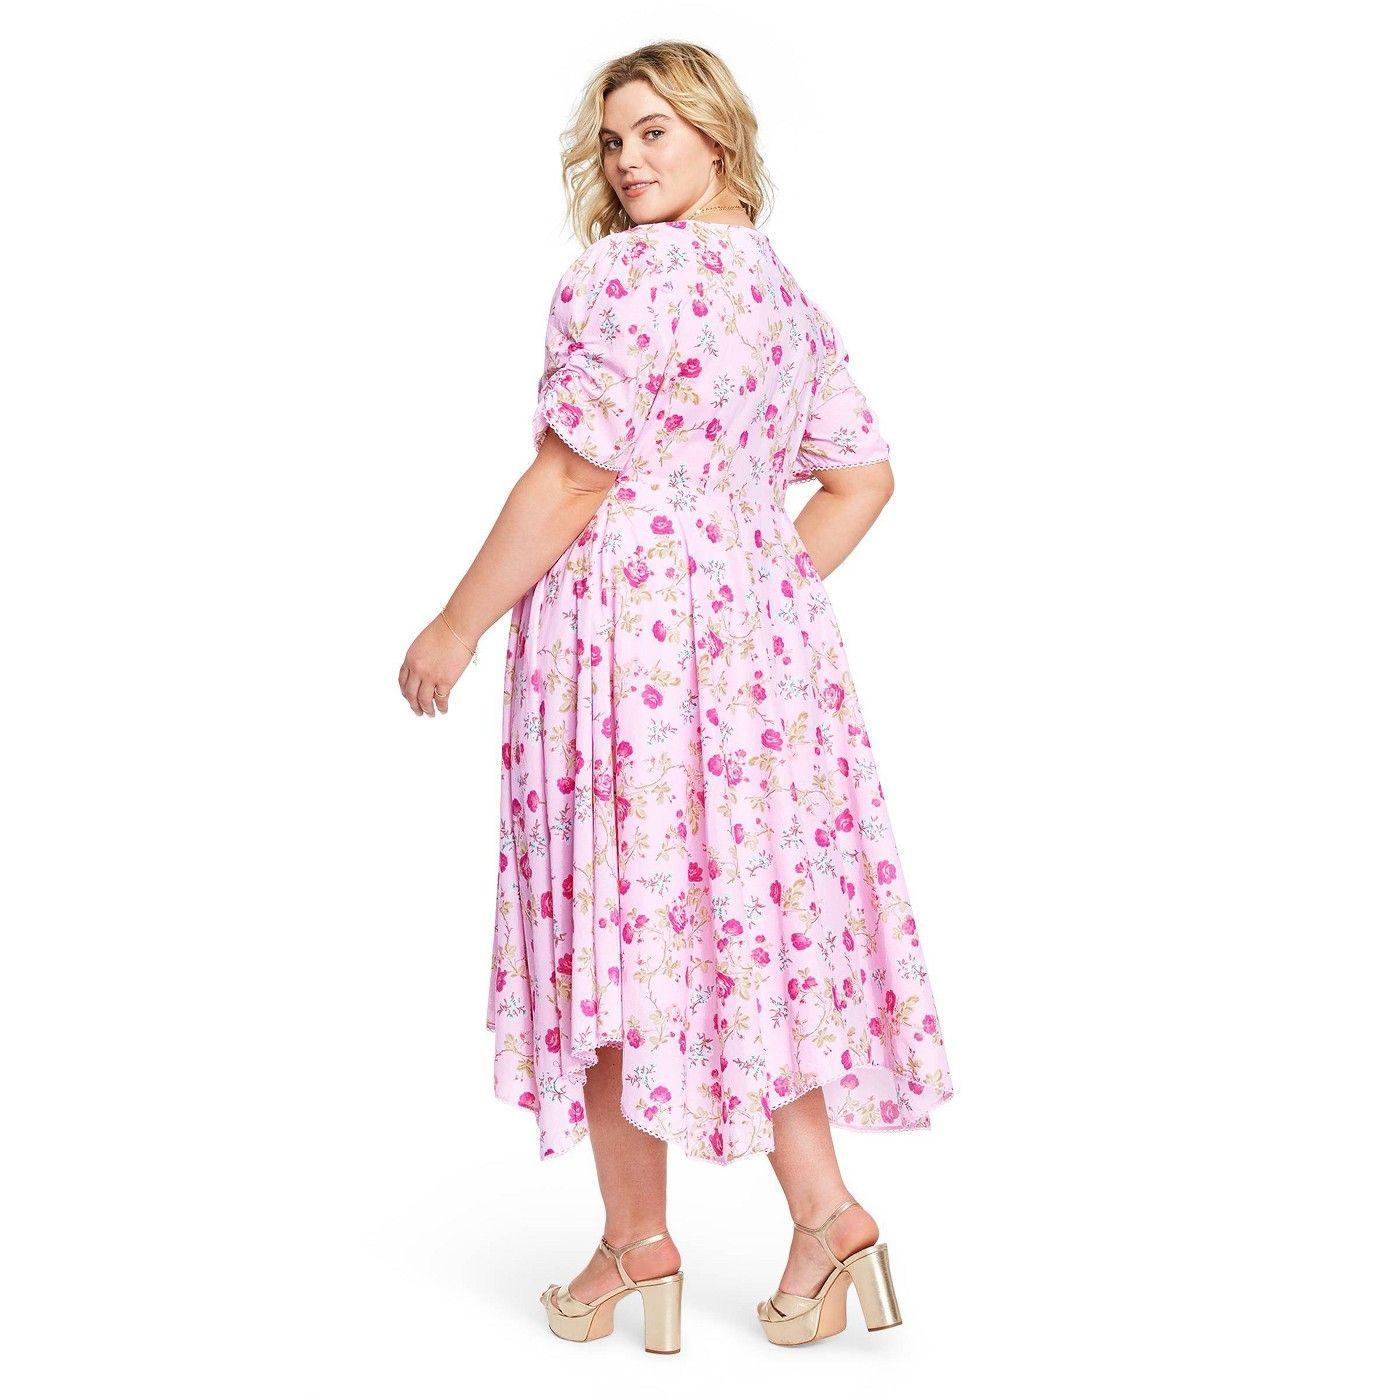 Women S Audrey Handkerchief Hem Dress Loveshackfancy For Target Regular Plus Light Pink Sponsored Hem Ad Dre Handkerchief Hem Dress Dresses Fashion [ 1400 x 1400 Pixel ]